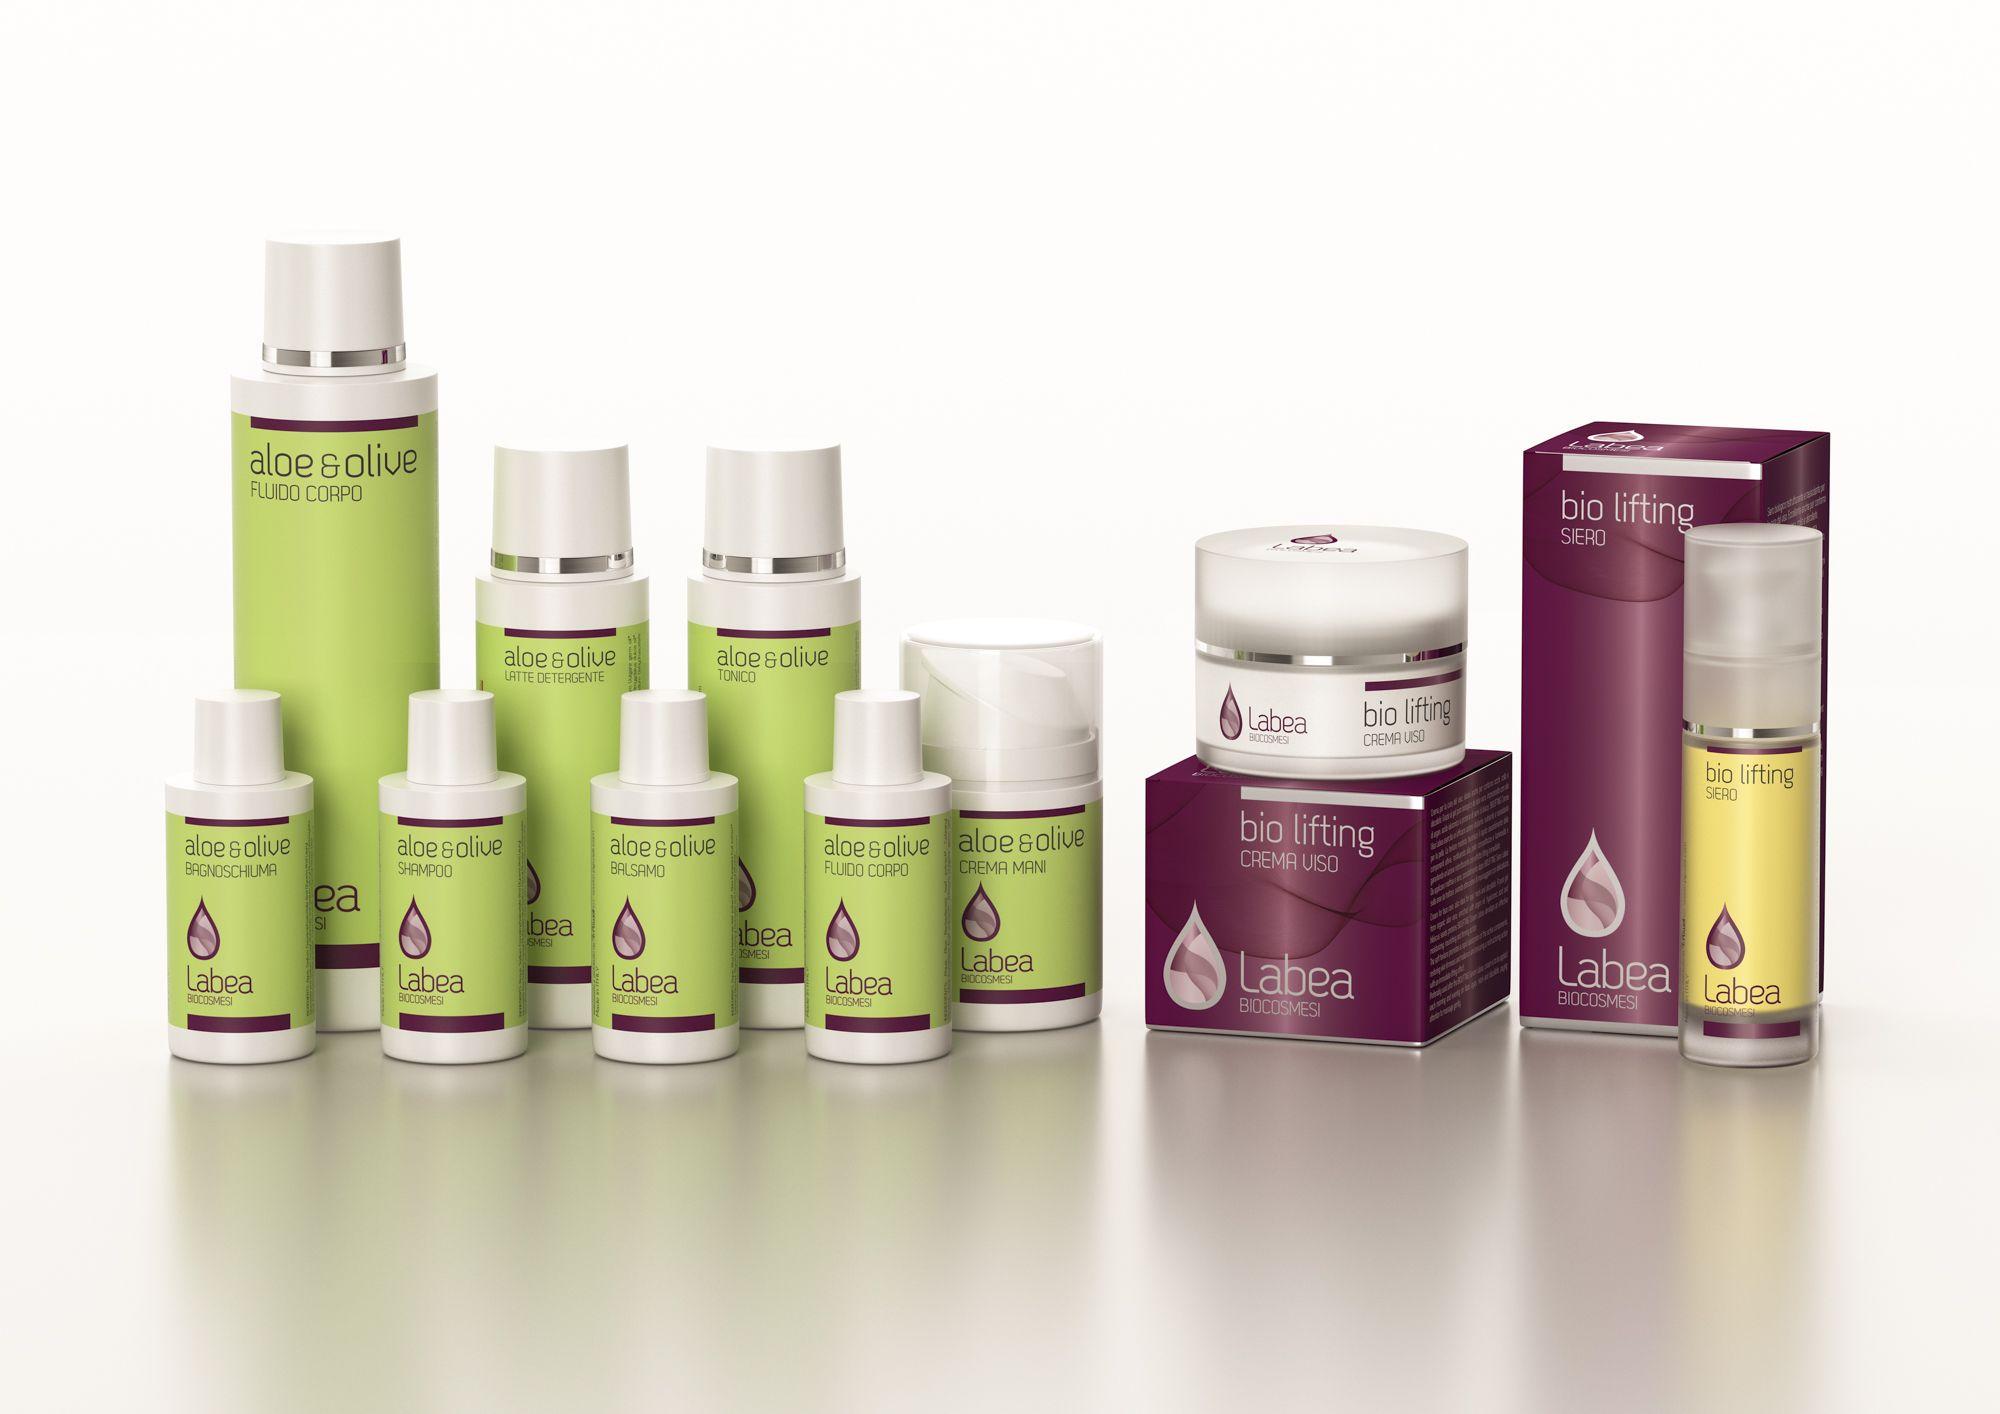 Bagnoschiuma Bio : Linea biolifting siero crema viso cosmetici biologici certificati